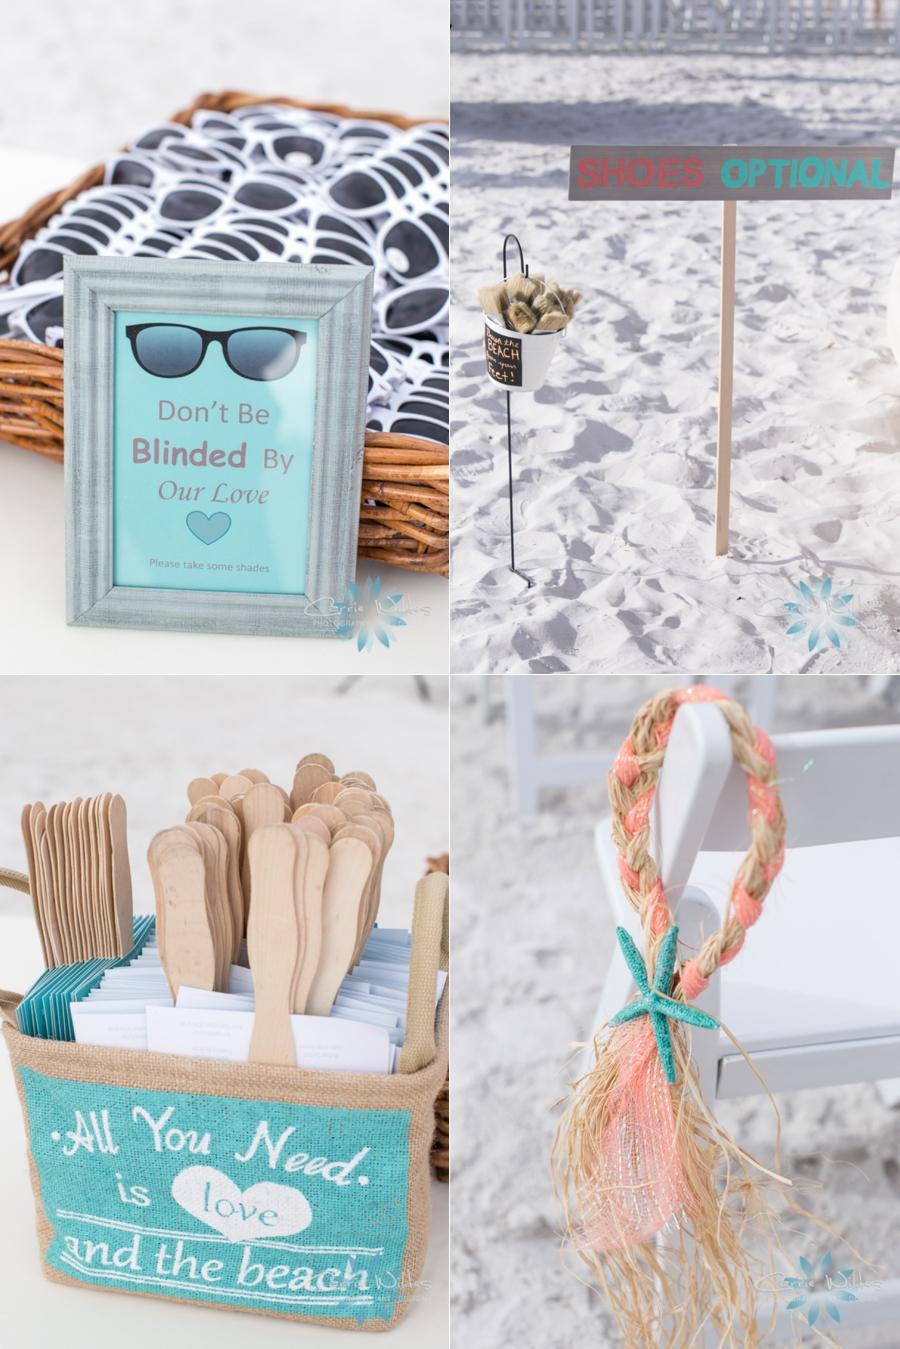 10_14_17 Kelly and Matt Hyatt Clearwater Beach Wedding_0018.jpg